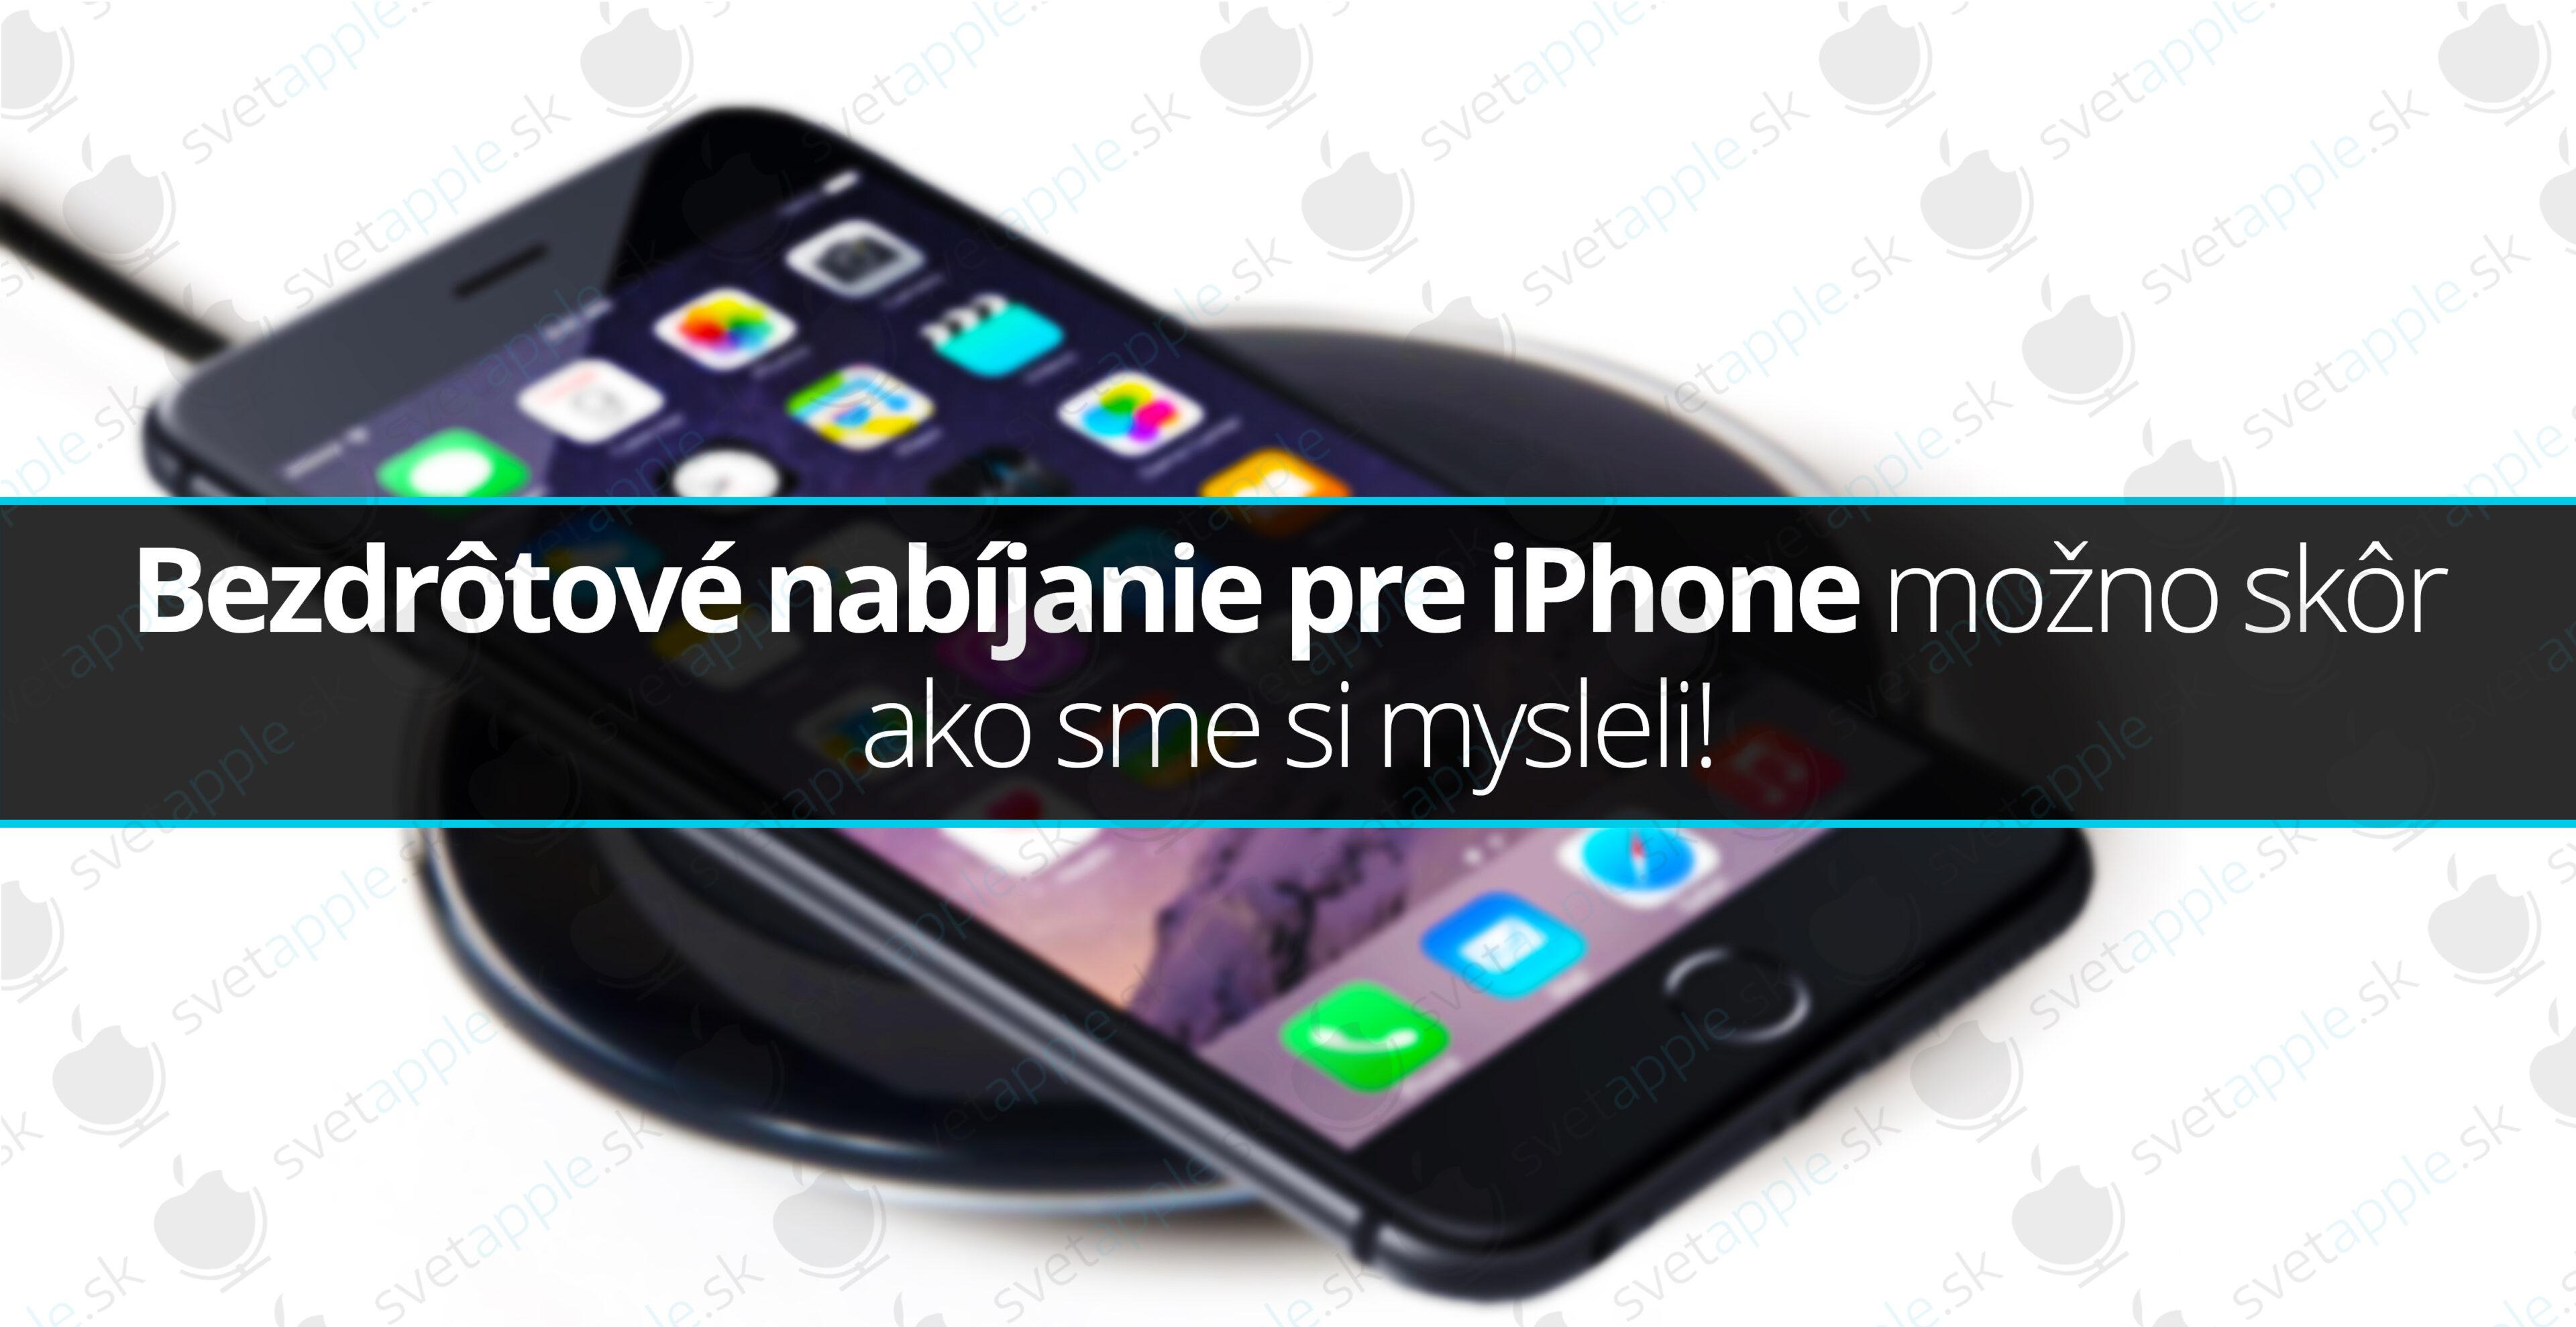 bezdrotove-nabijanie-iphone--SvetApple